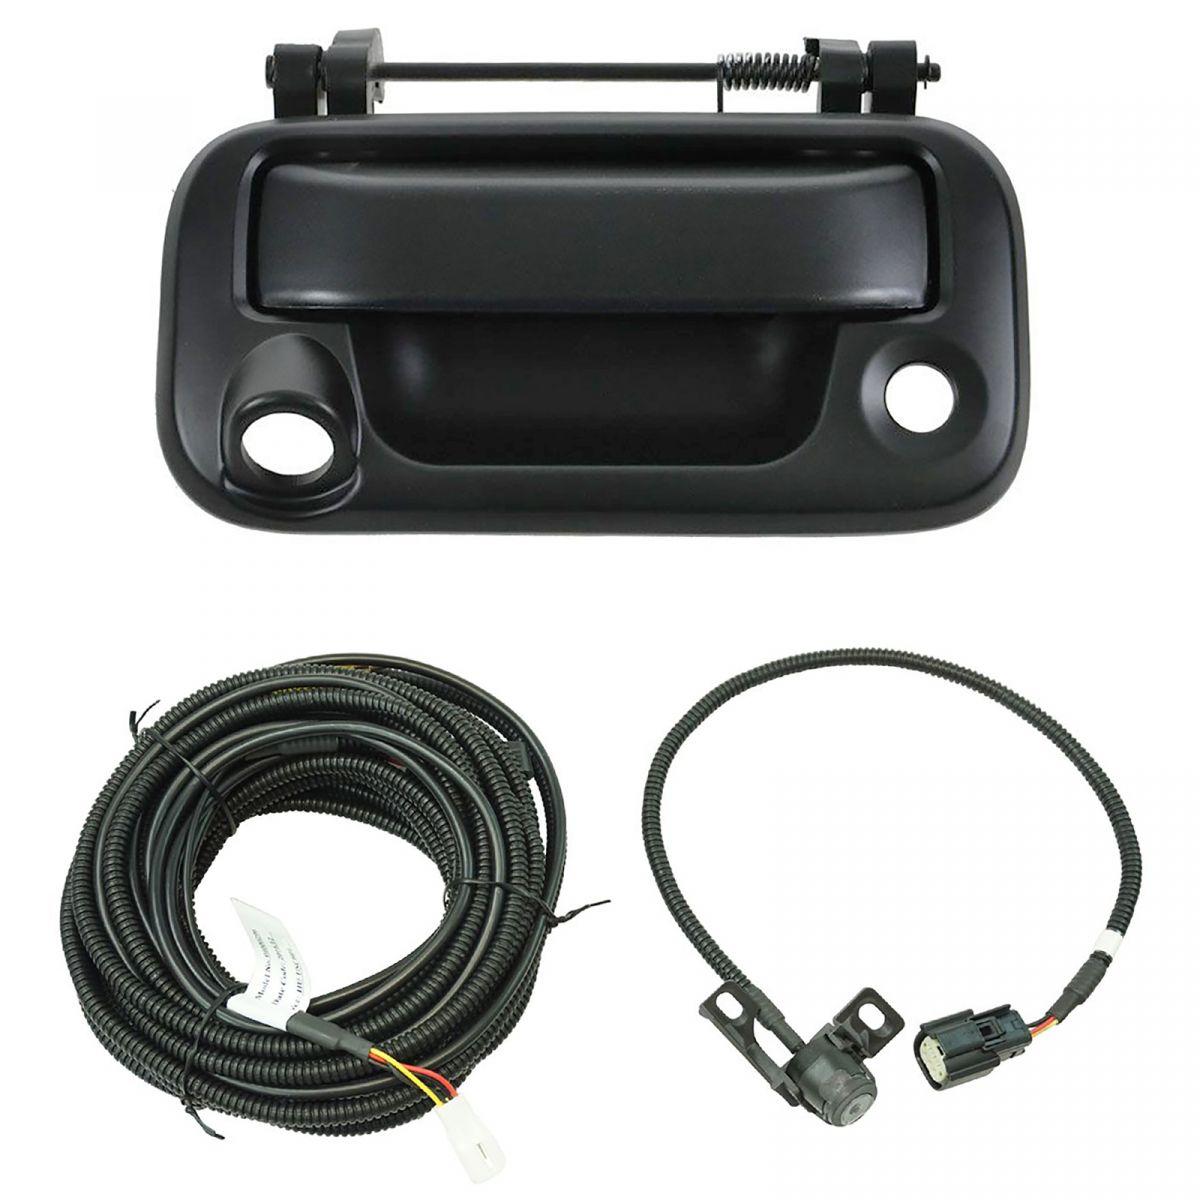 Rear View Camera Add On Kit w/ Wiring Harness & Tailgate ...